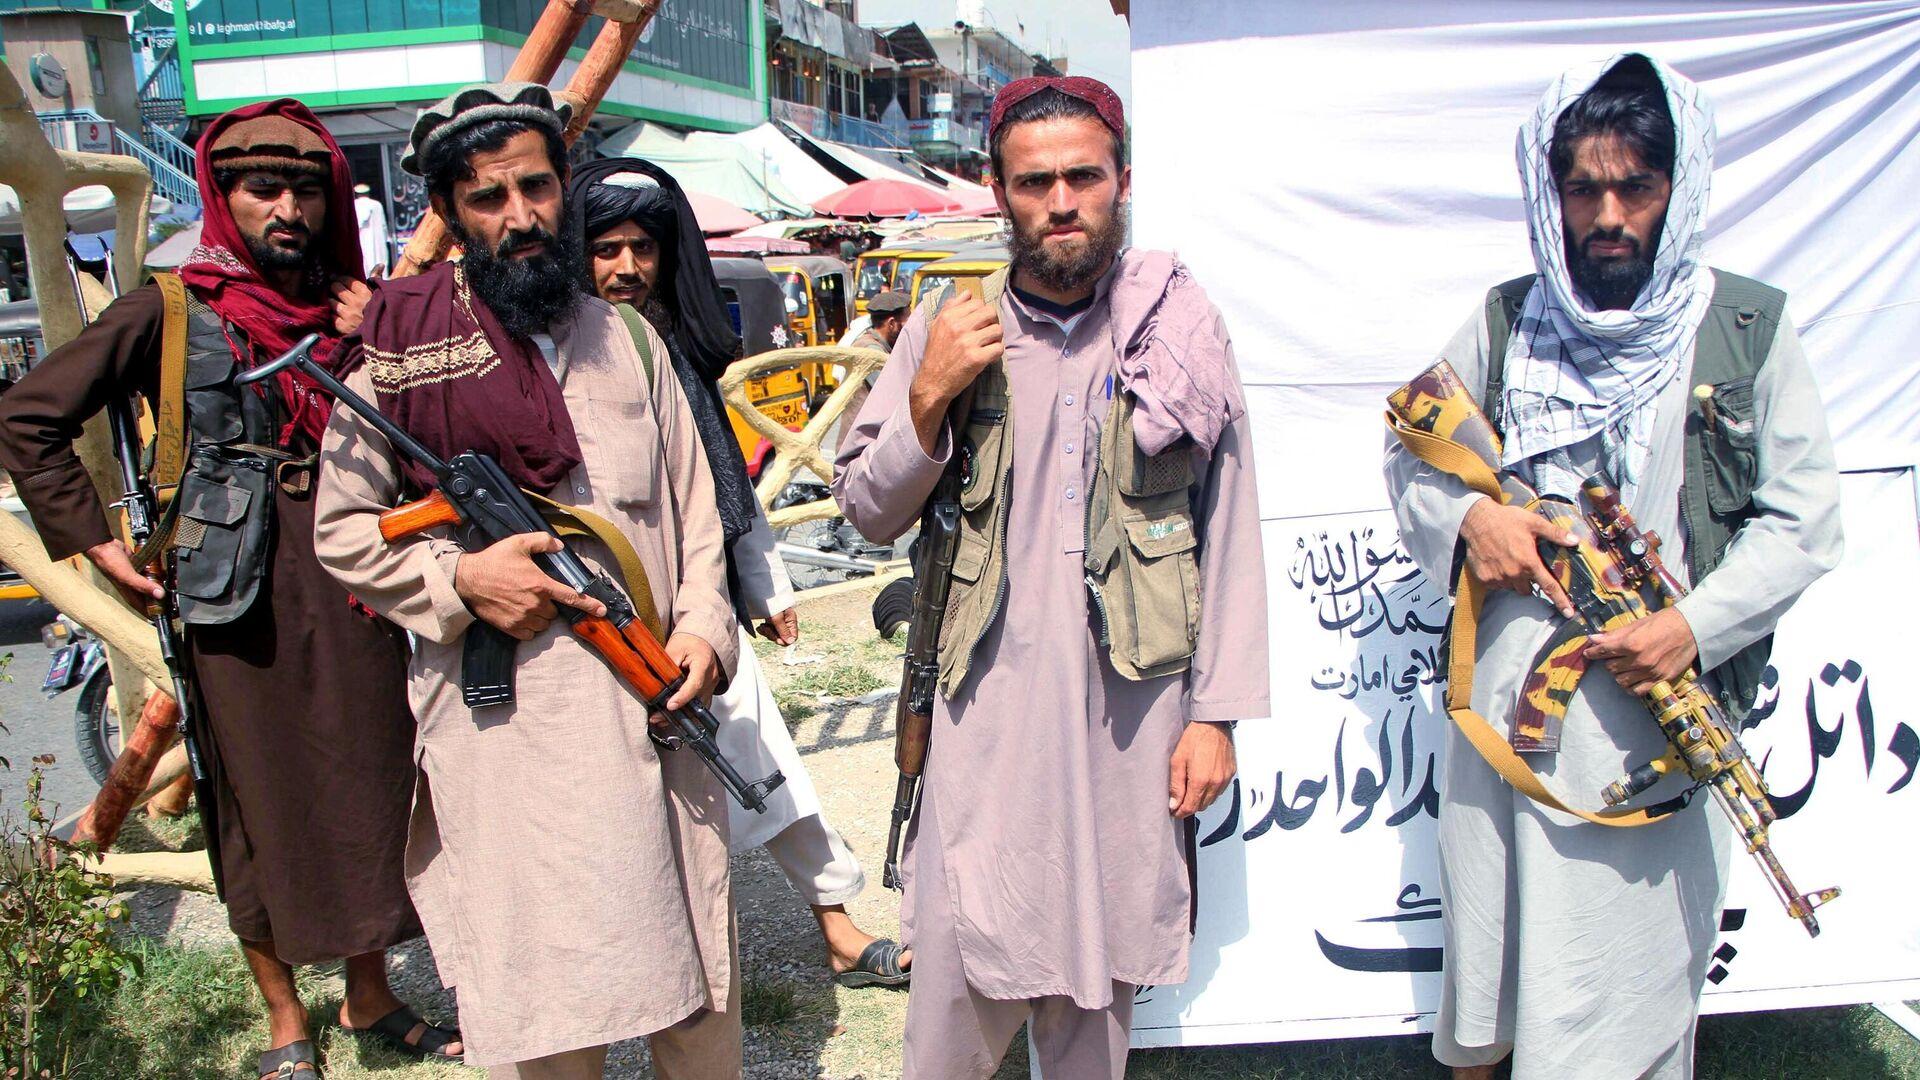 Талибы заявили о контроле над всей территорией Афганистане